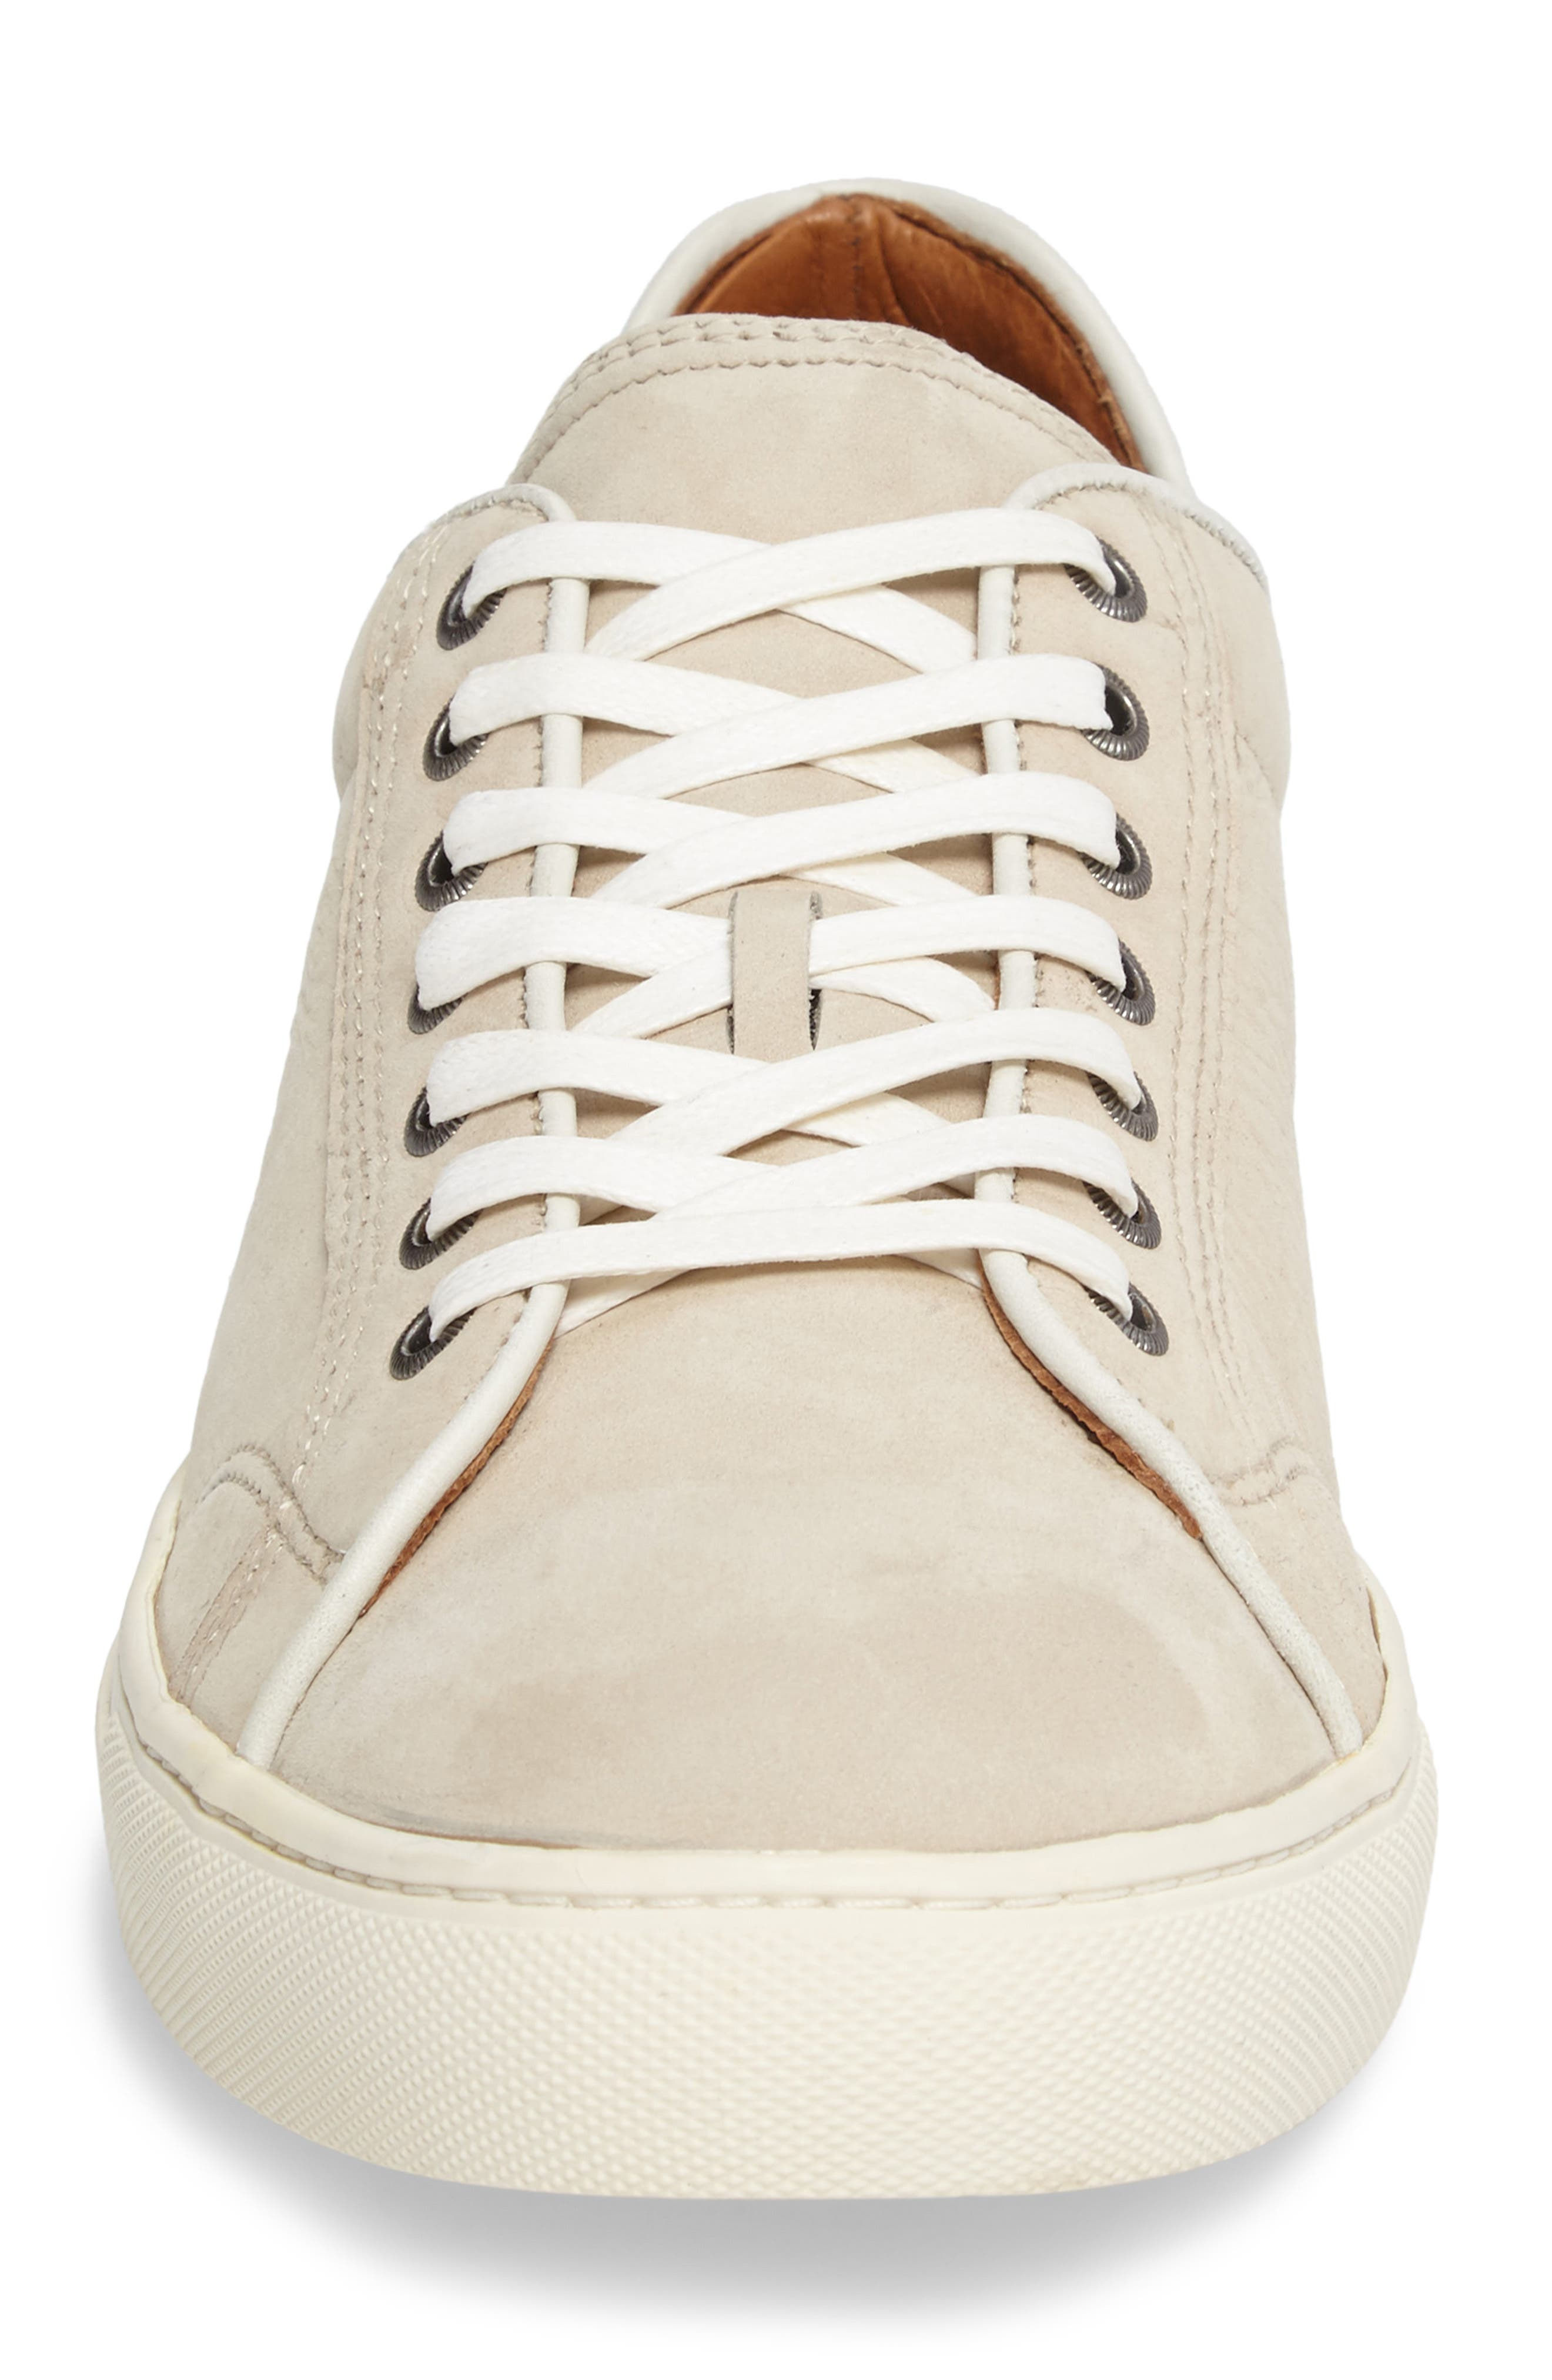 Walker Low Top Sneaker,                             Alternate thumbnail 4, color,                             Ivory